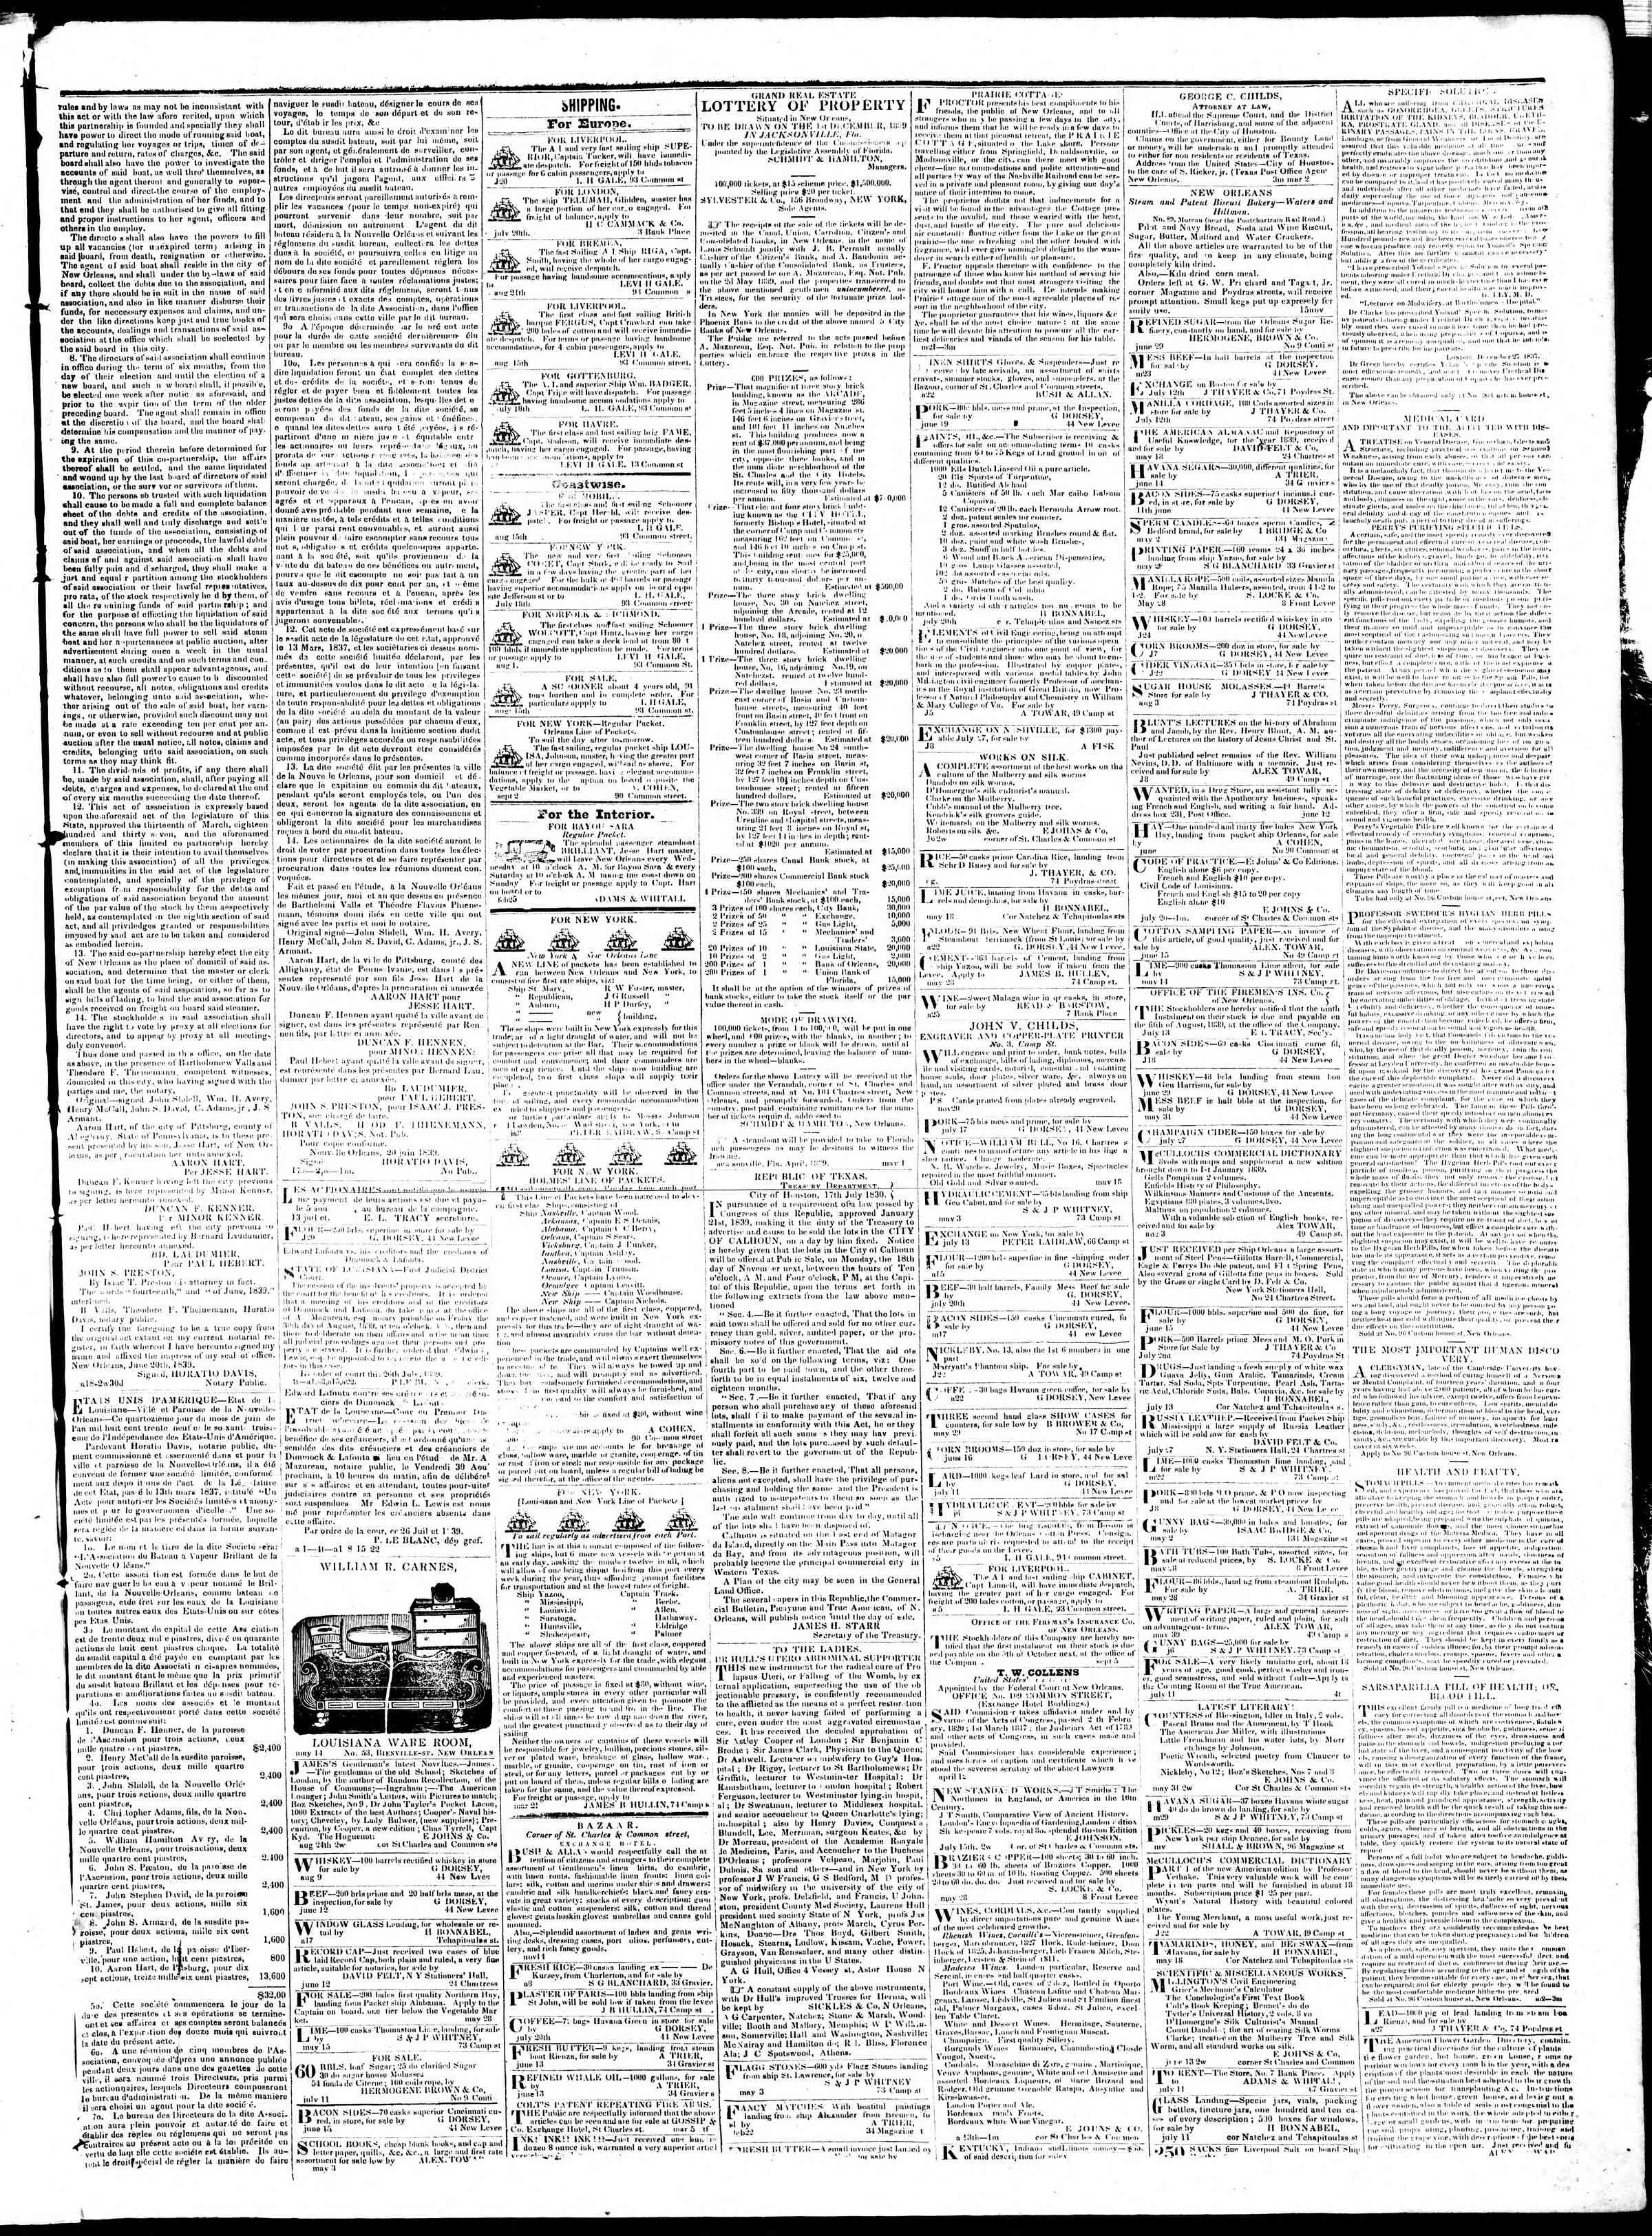 September 7, 1839 Tarihli True American Gazetesi Sayfa 3